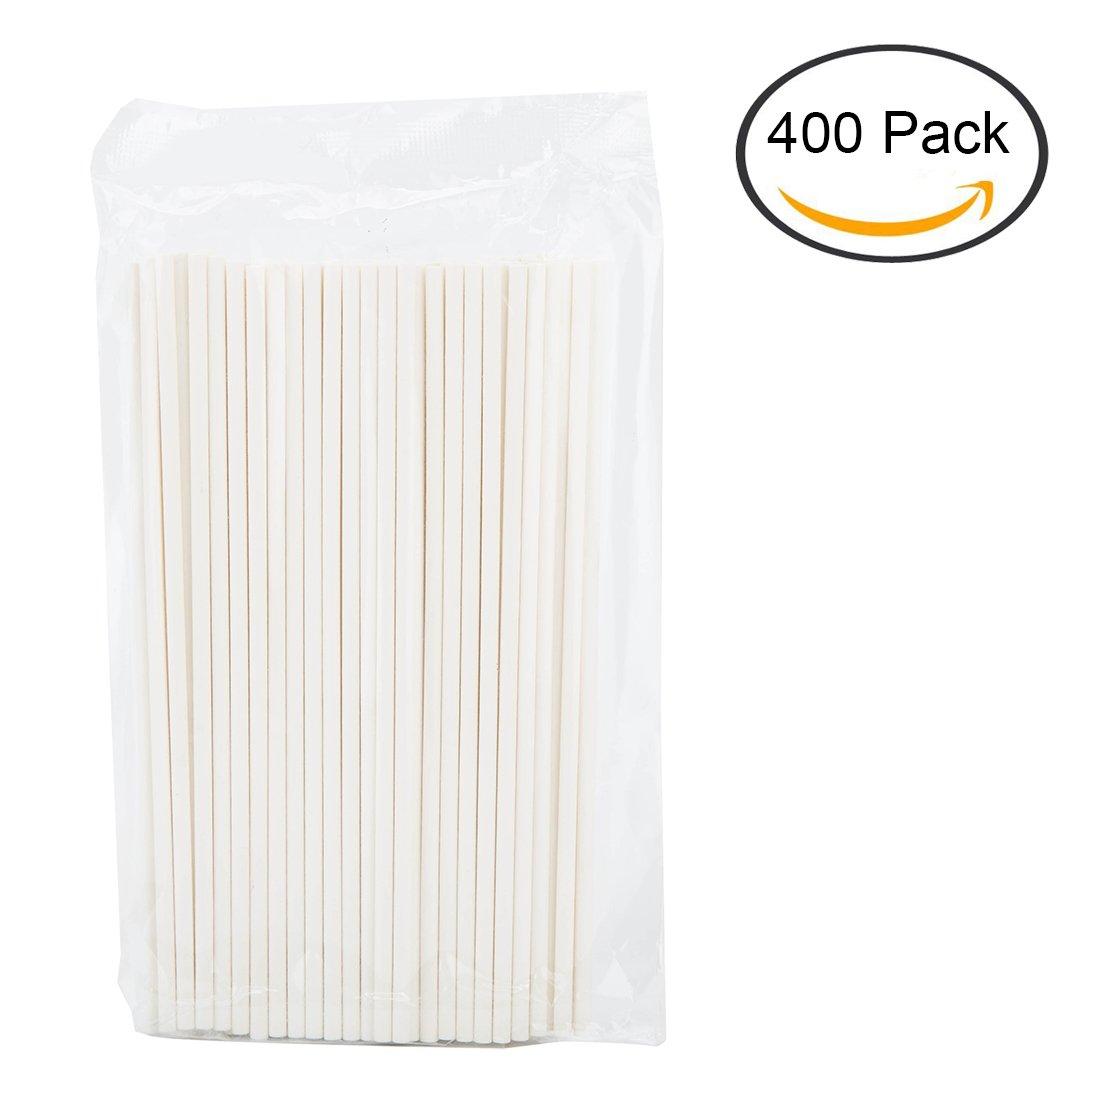 Tosnail 6-Inch Lollipop Sticks Cake Pop Sticks - 400 Pack